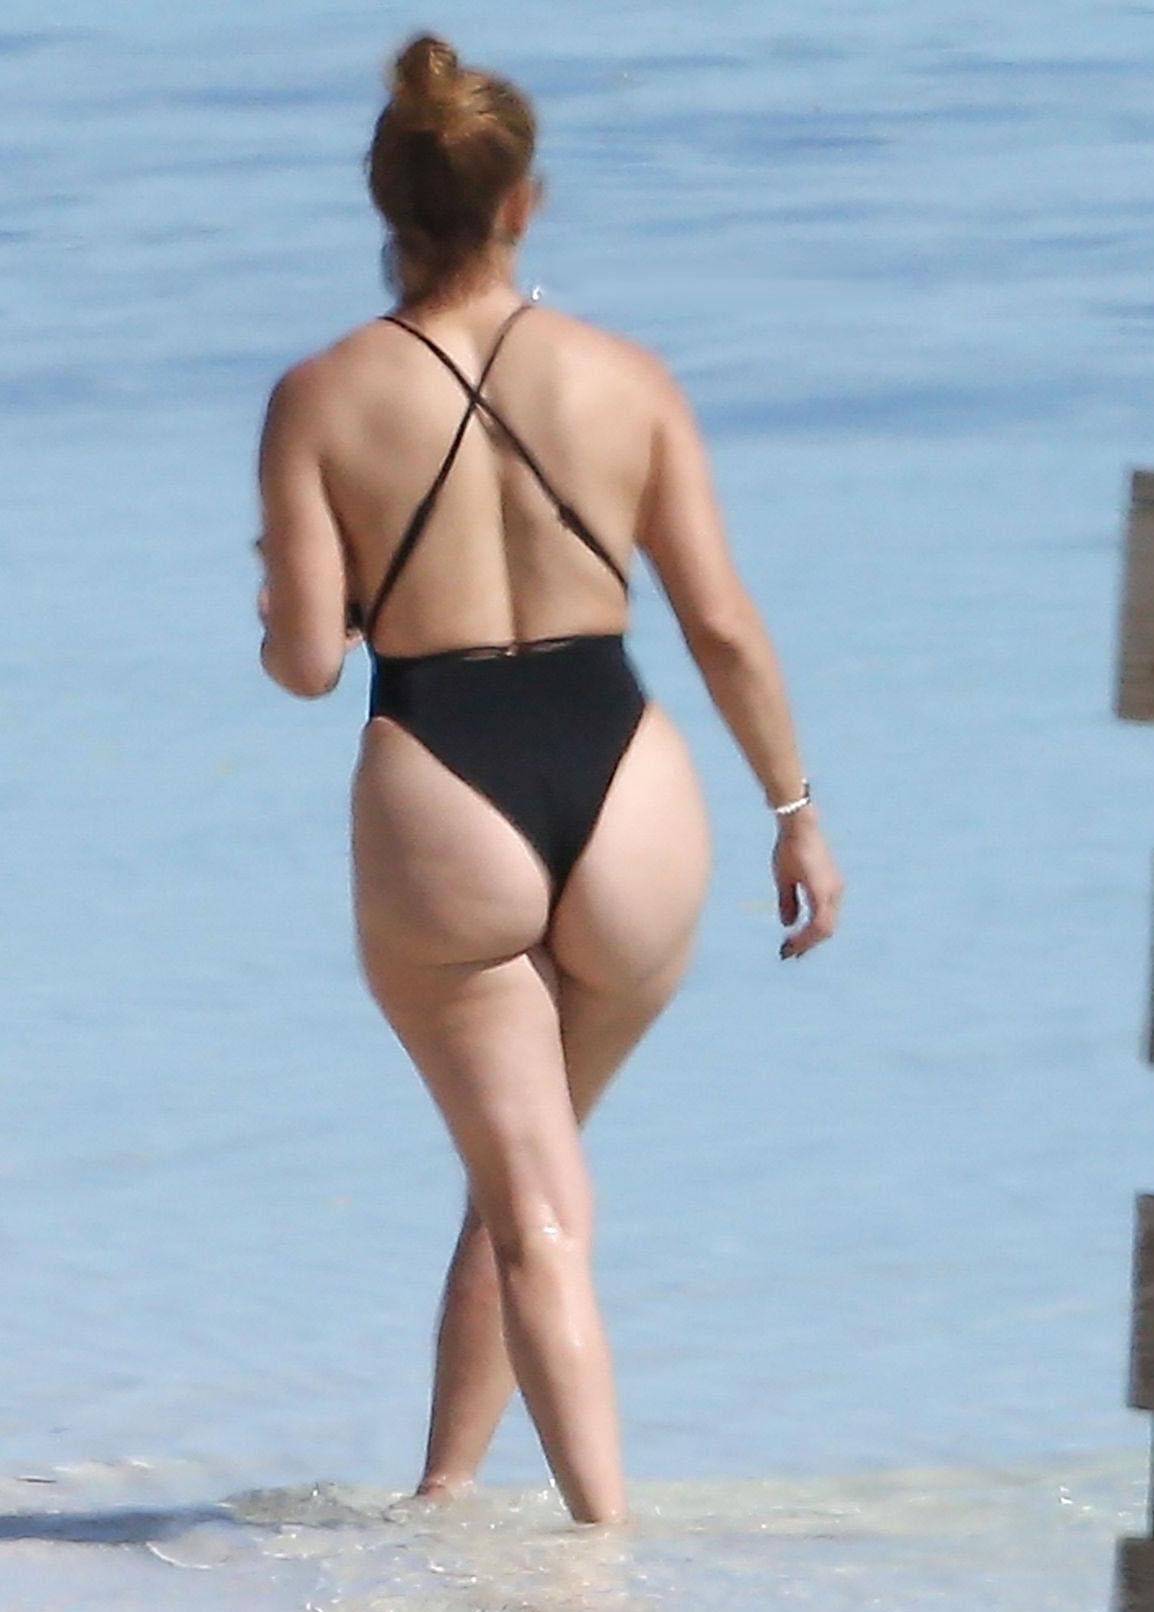 Jennifer Lopez Huge Ass In Thong Swimsuit Photos